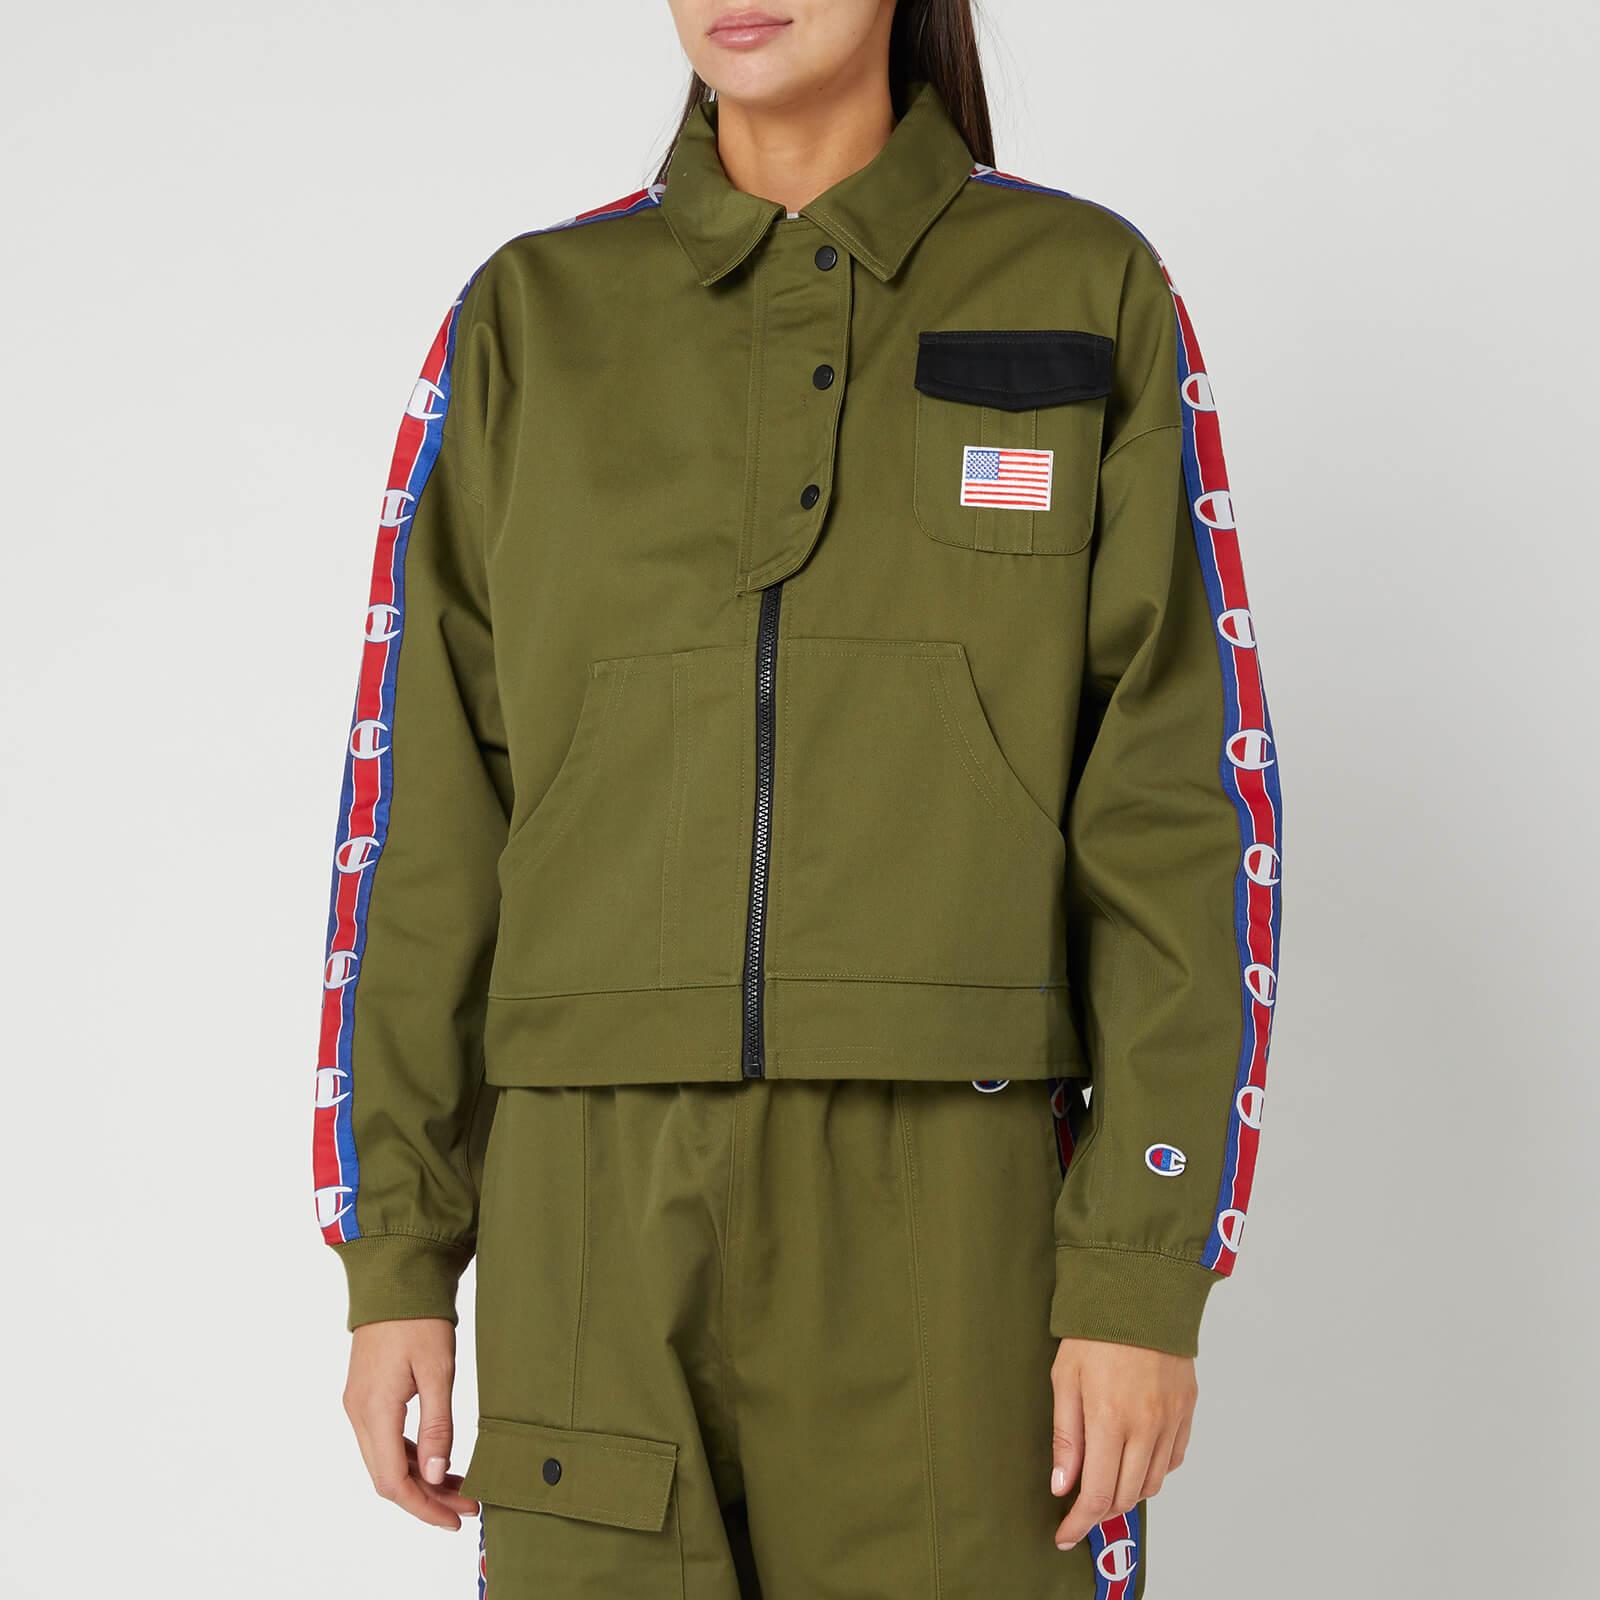 Champion Women's Milatry Jacket - Khaki - L